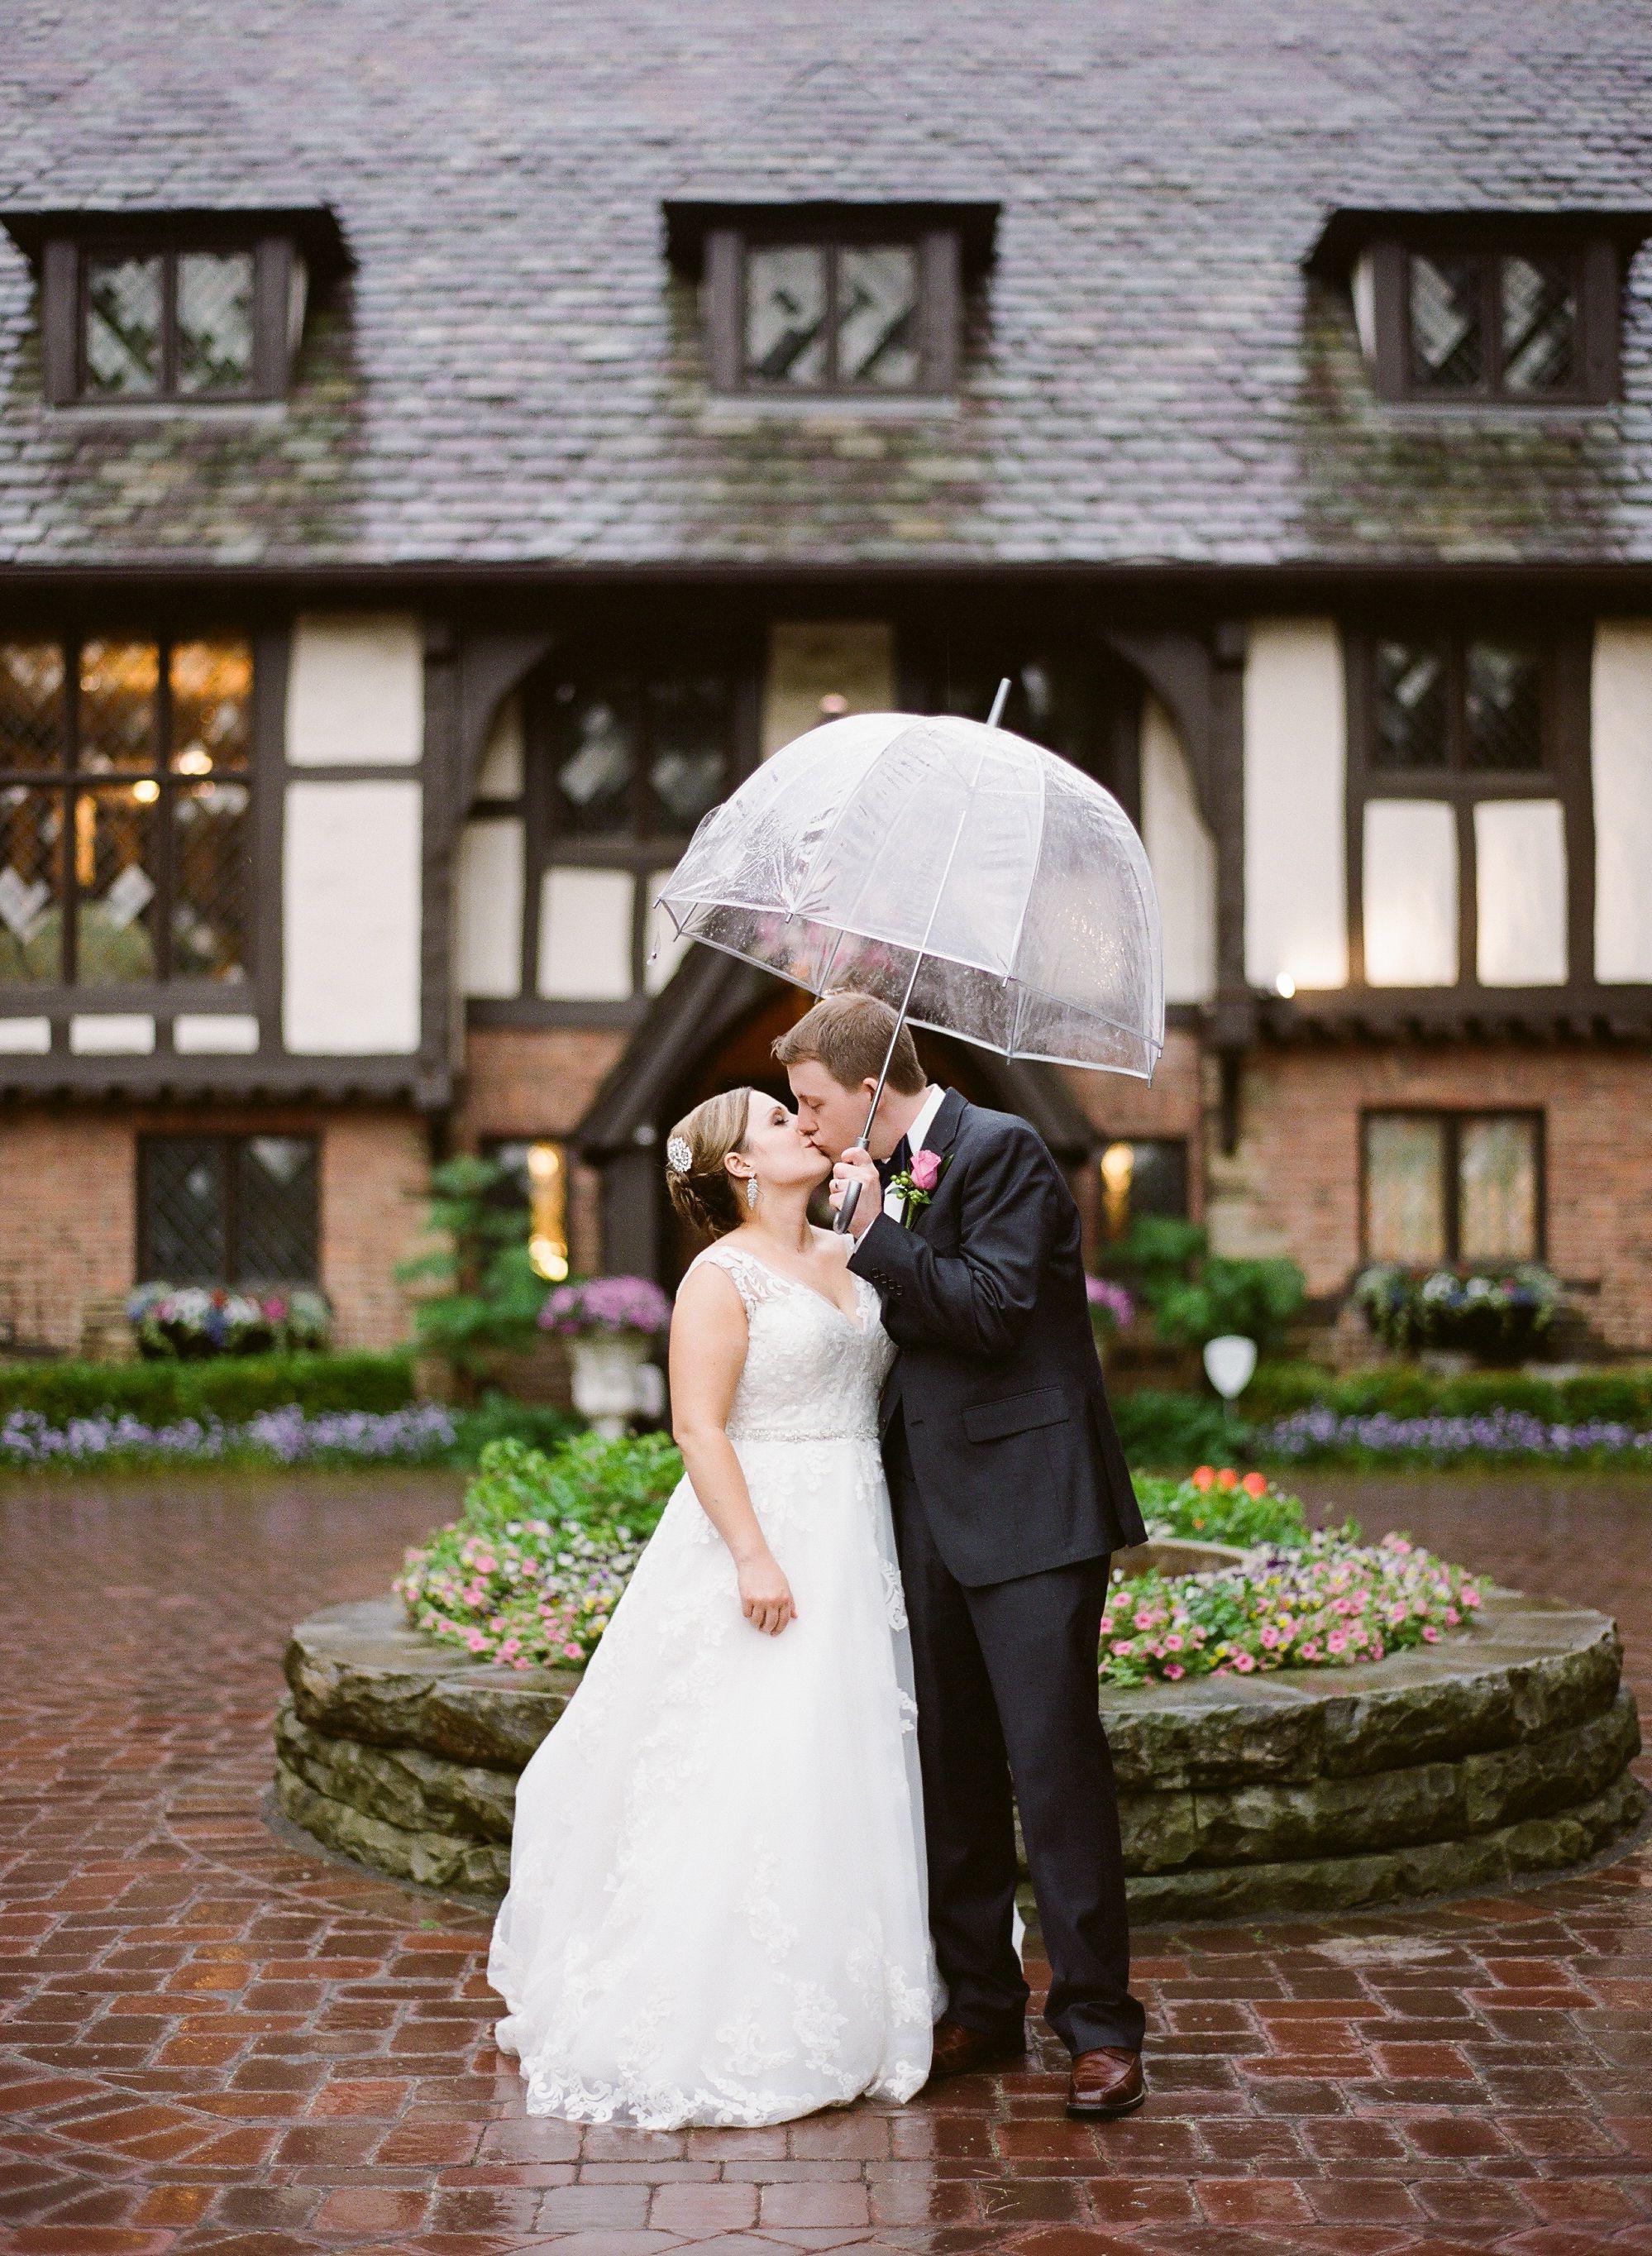 Chagrin falls ohio indoor and outdoor wedding venue